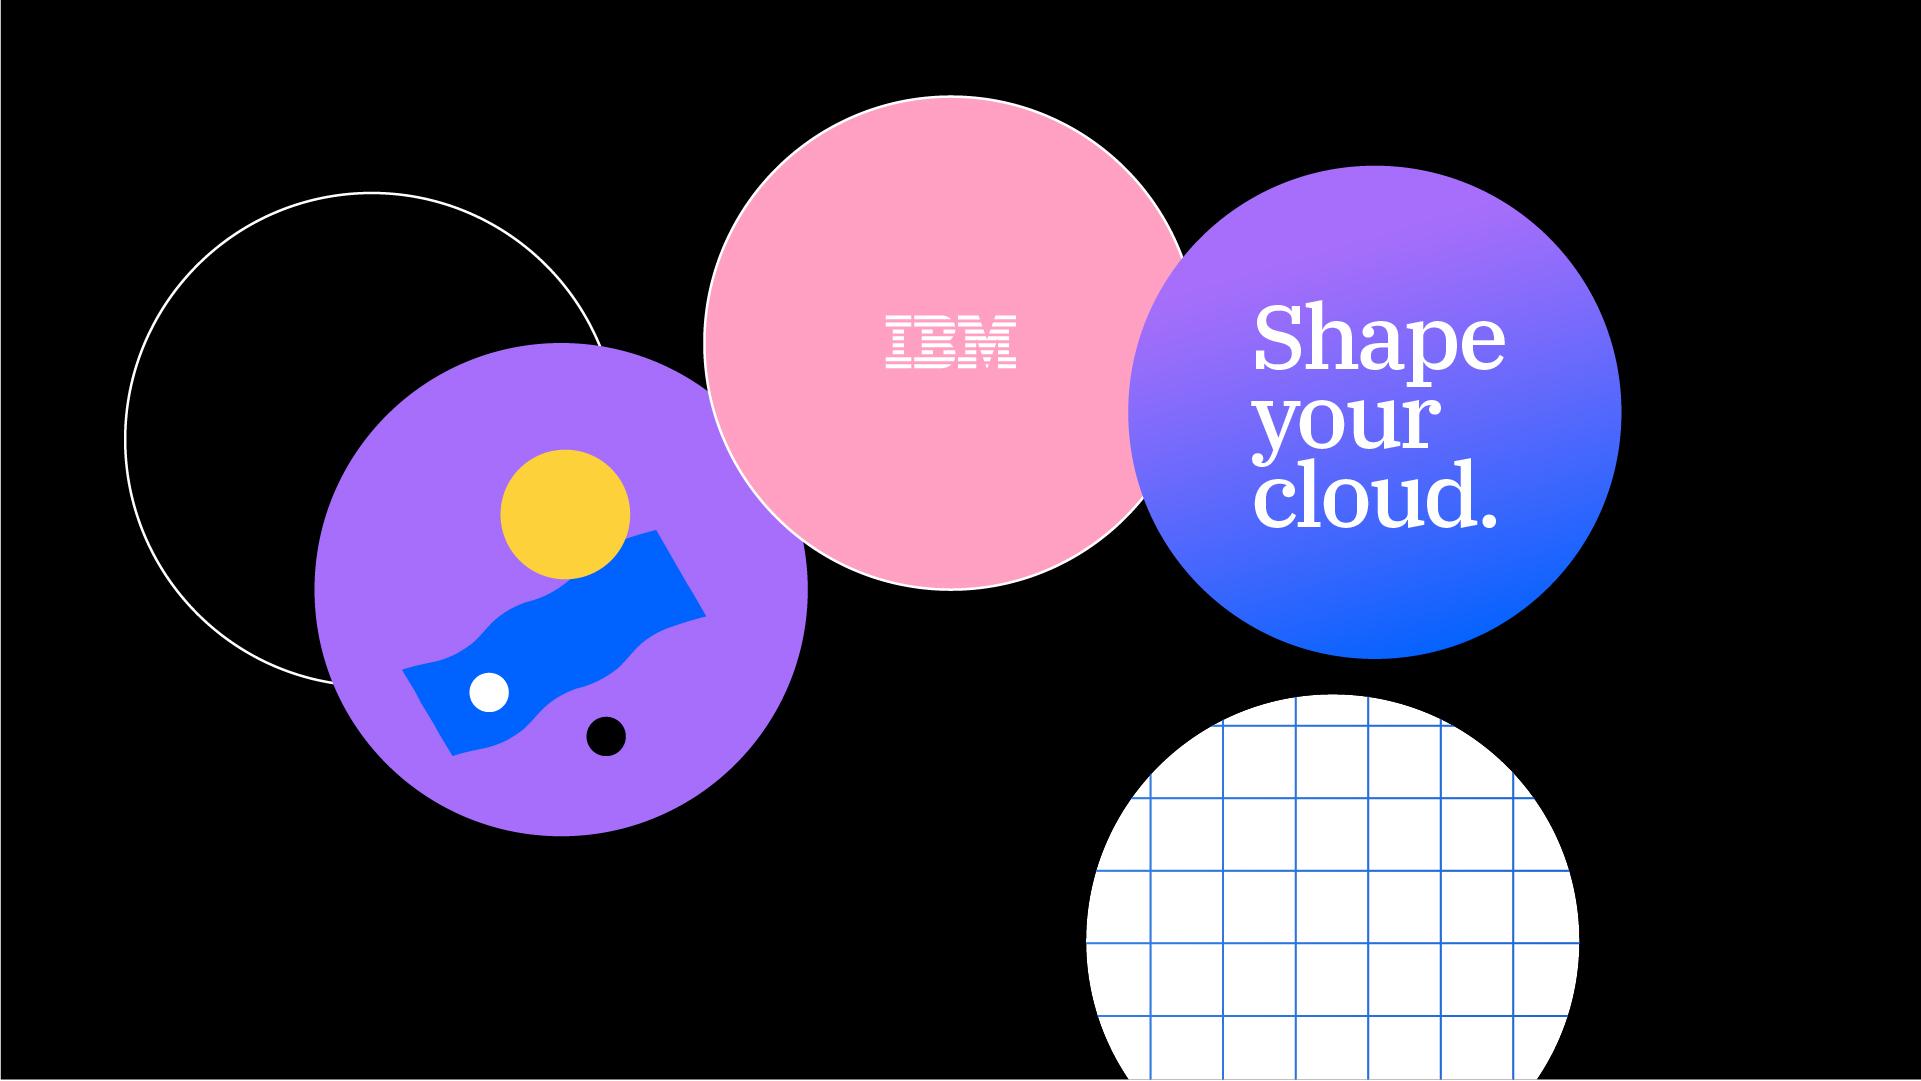 IBM_SHAPE-YOUR-CLOUD_DC_EDITS_BH_proceso_IBM-process-20.jpg